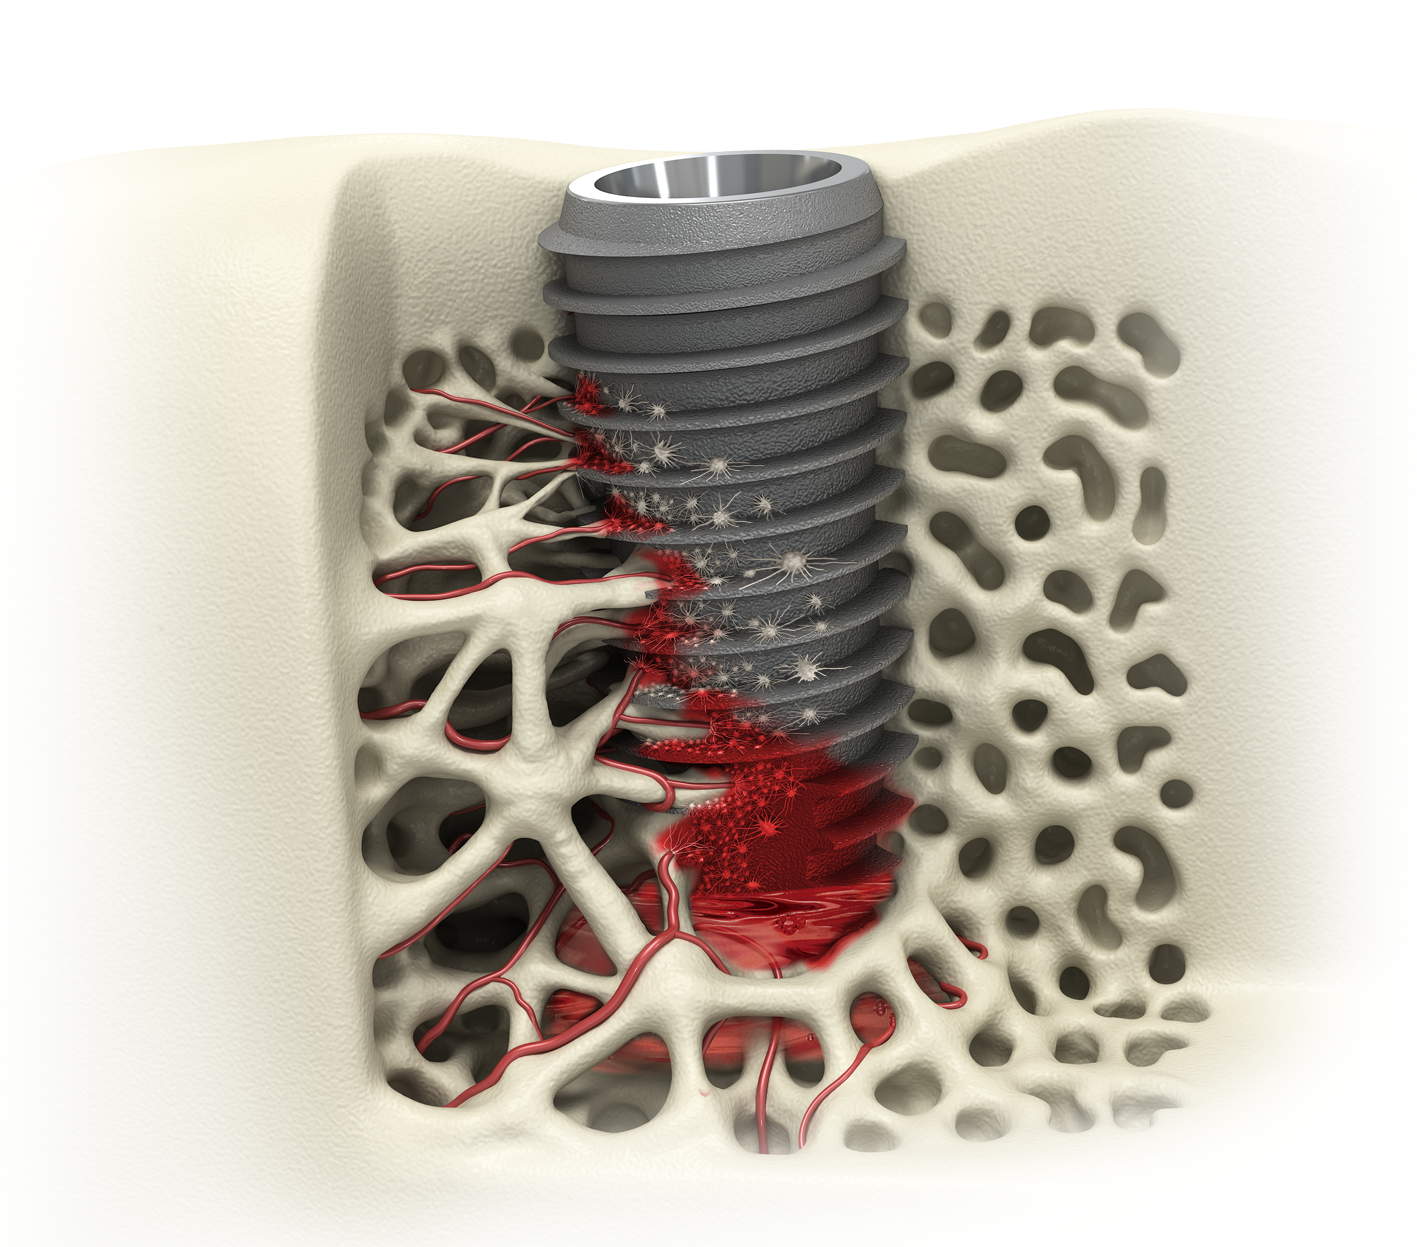 UFII Implant [Narrow]